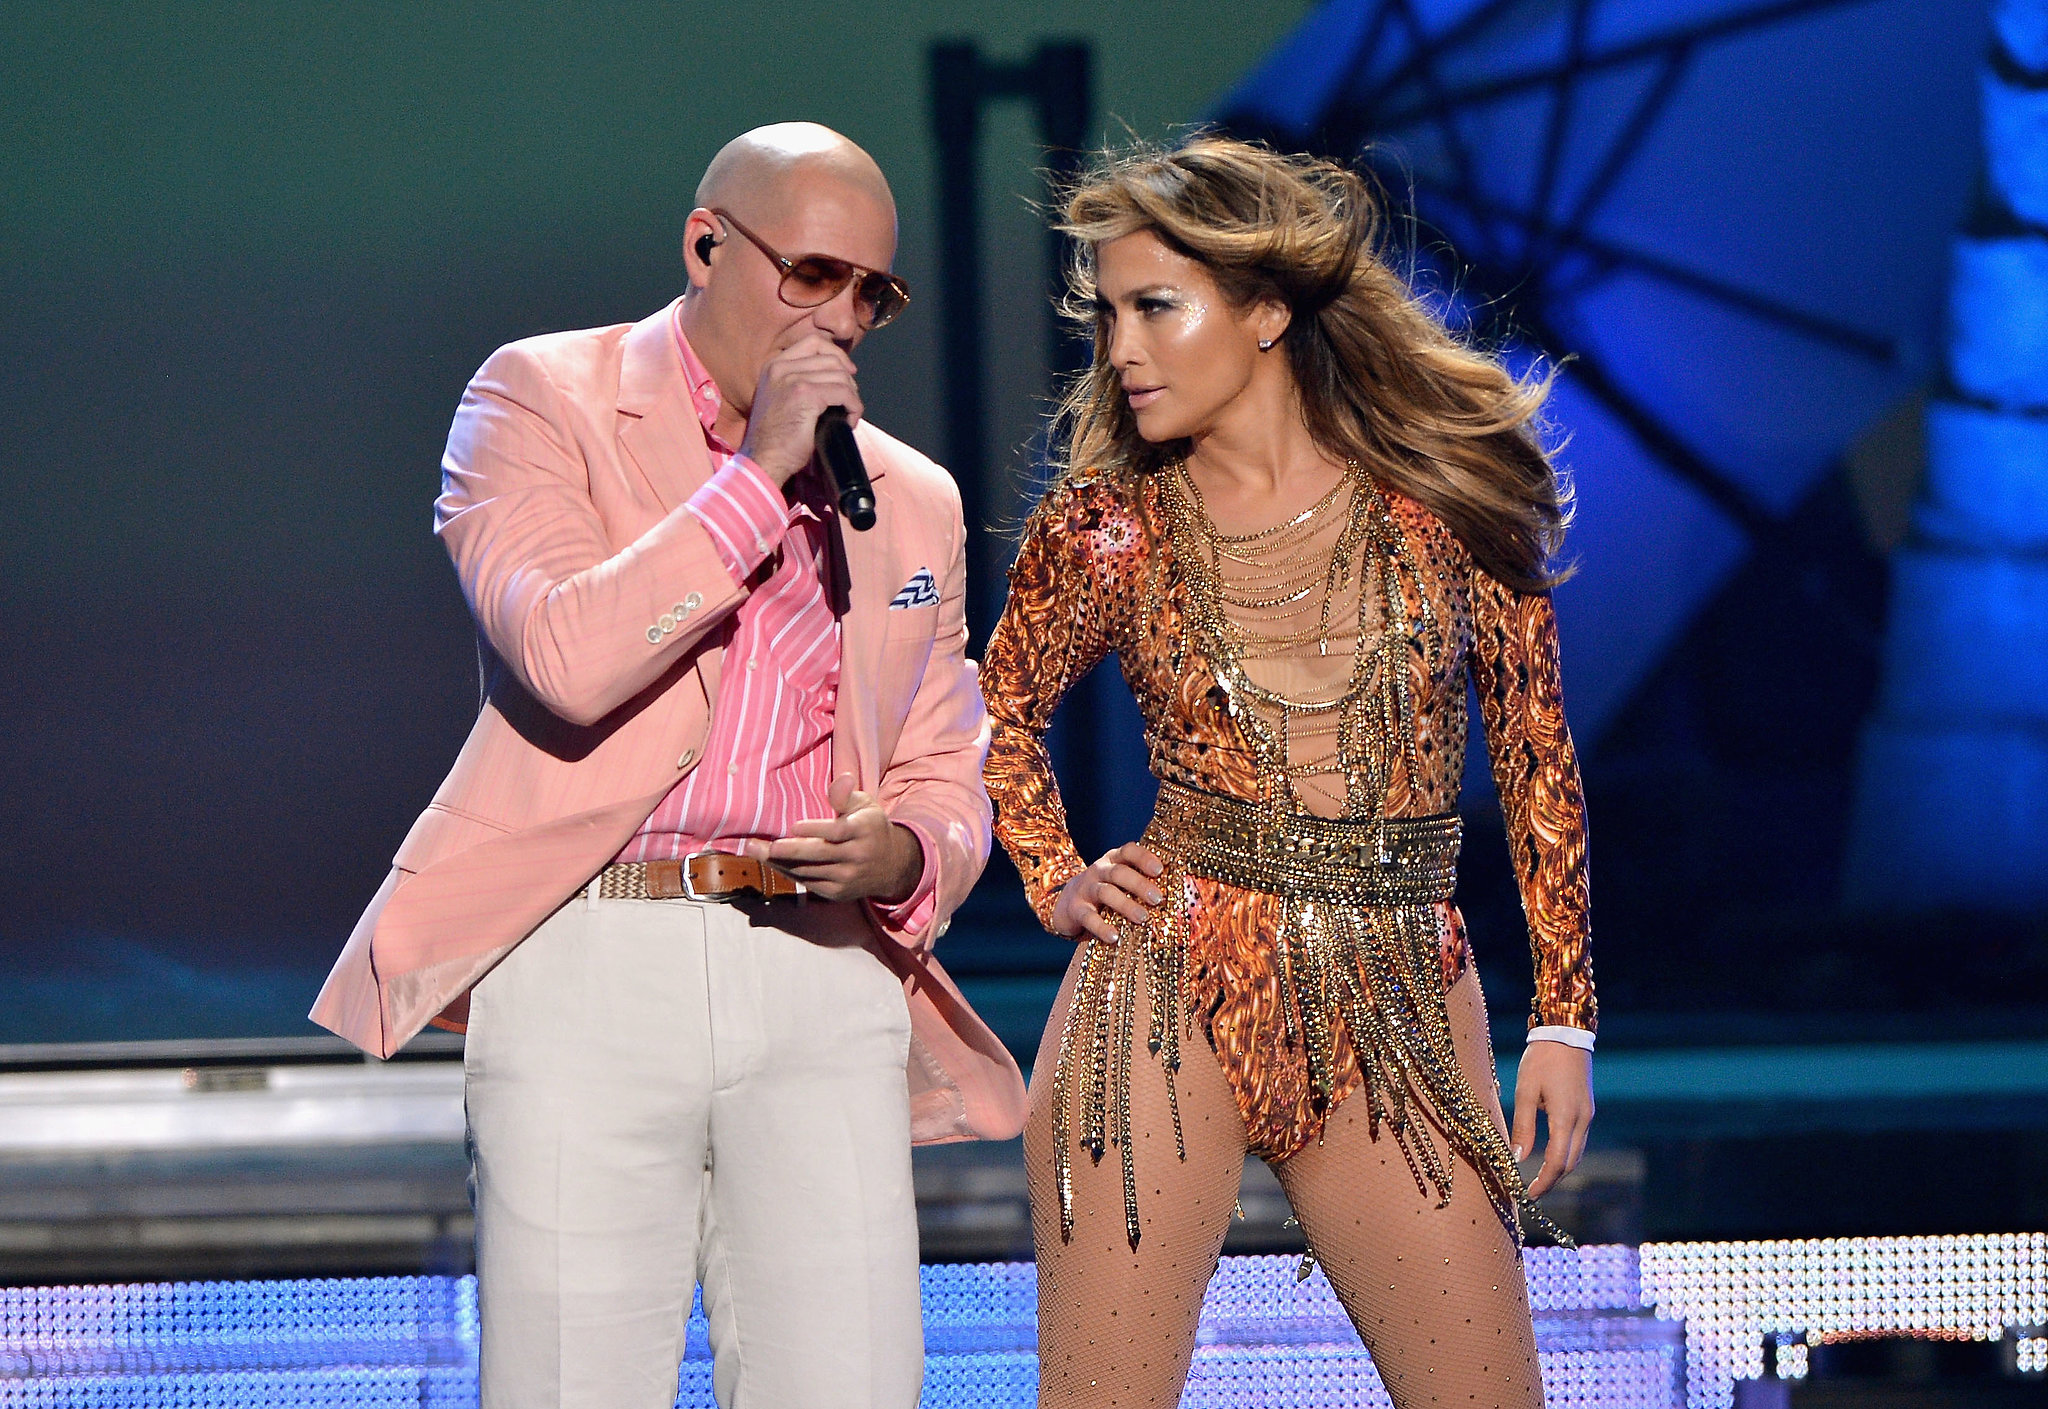 Jennifer-Lopez-Pitbull-performed-together-Premios-Juventud